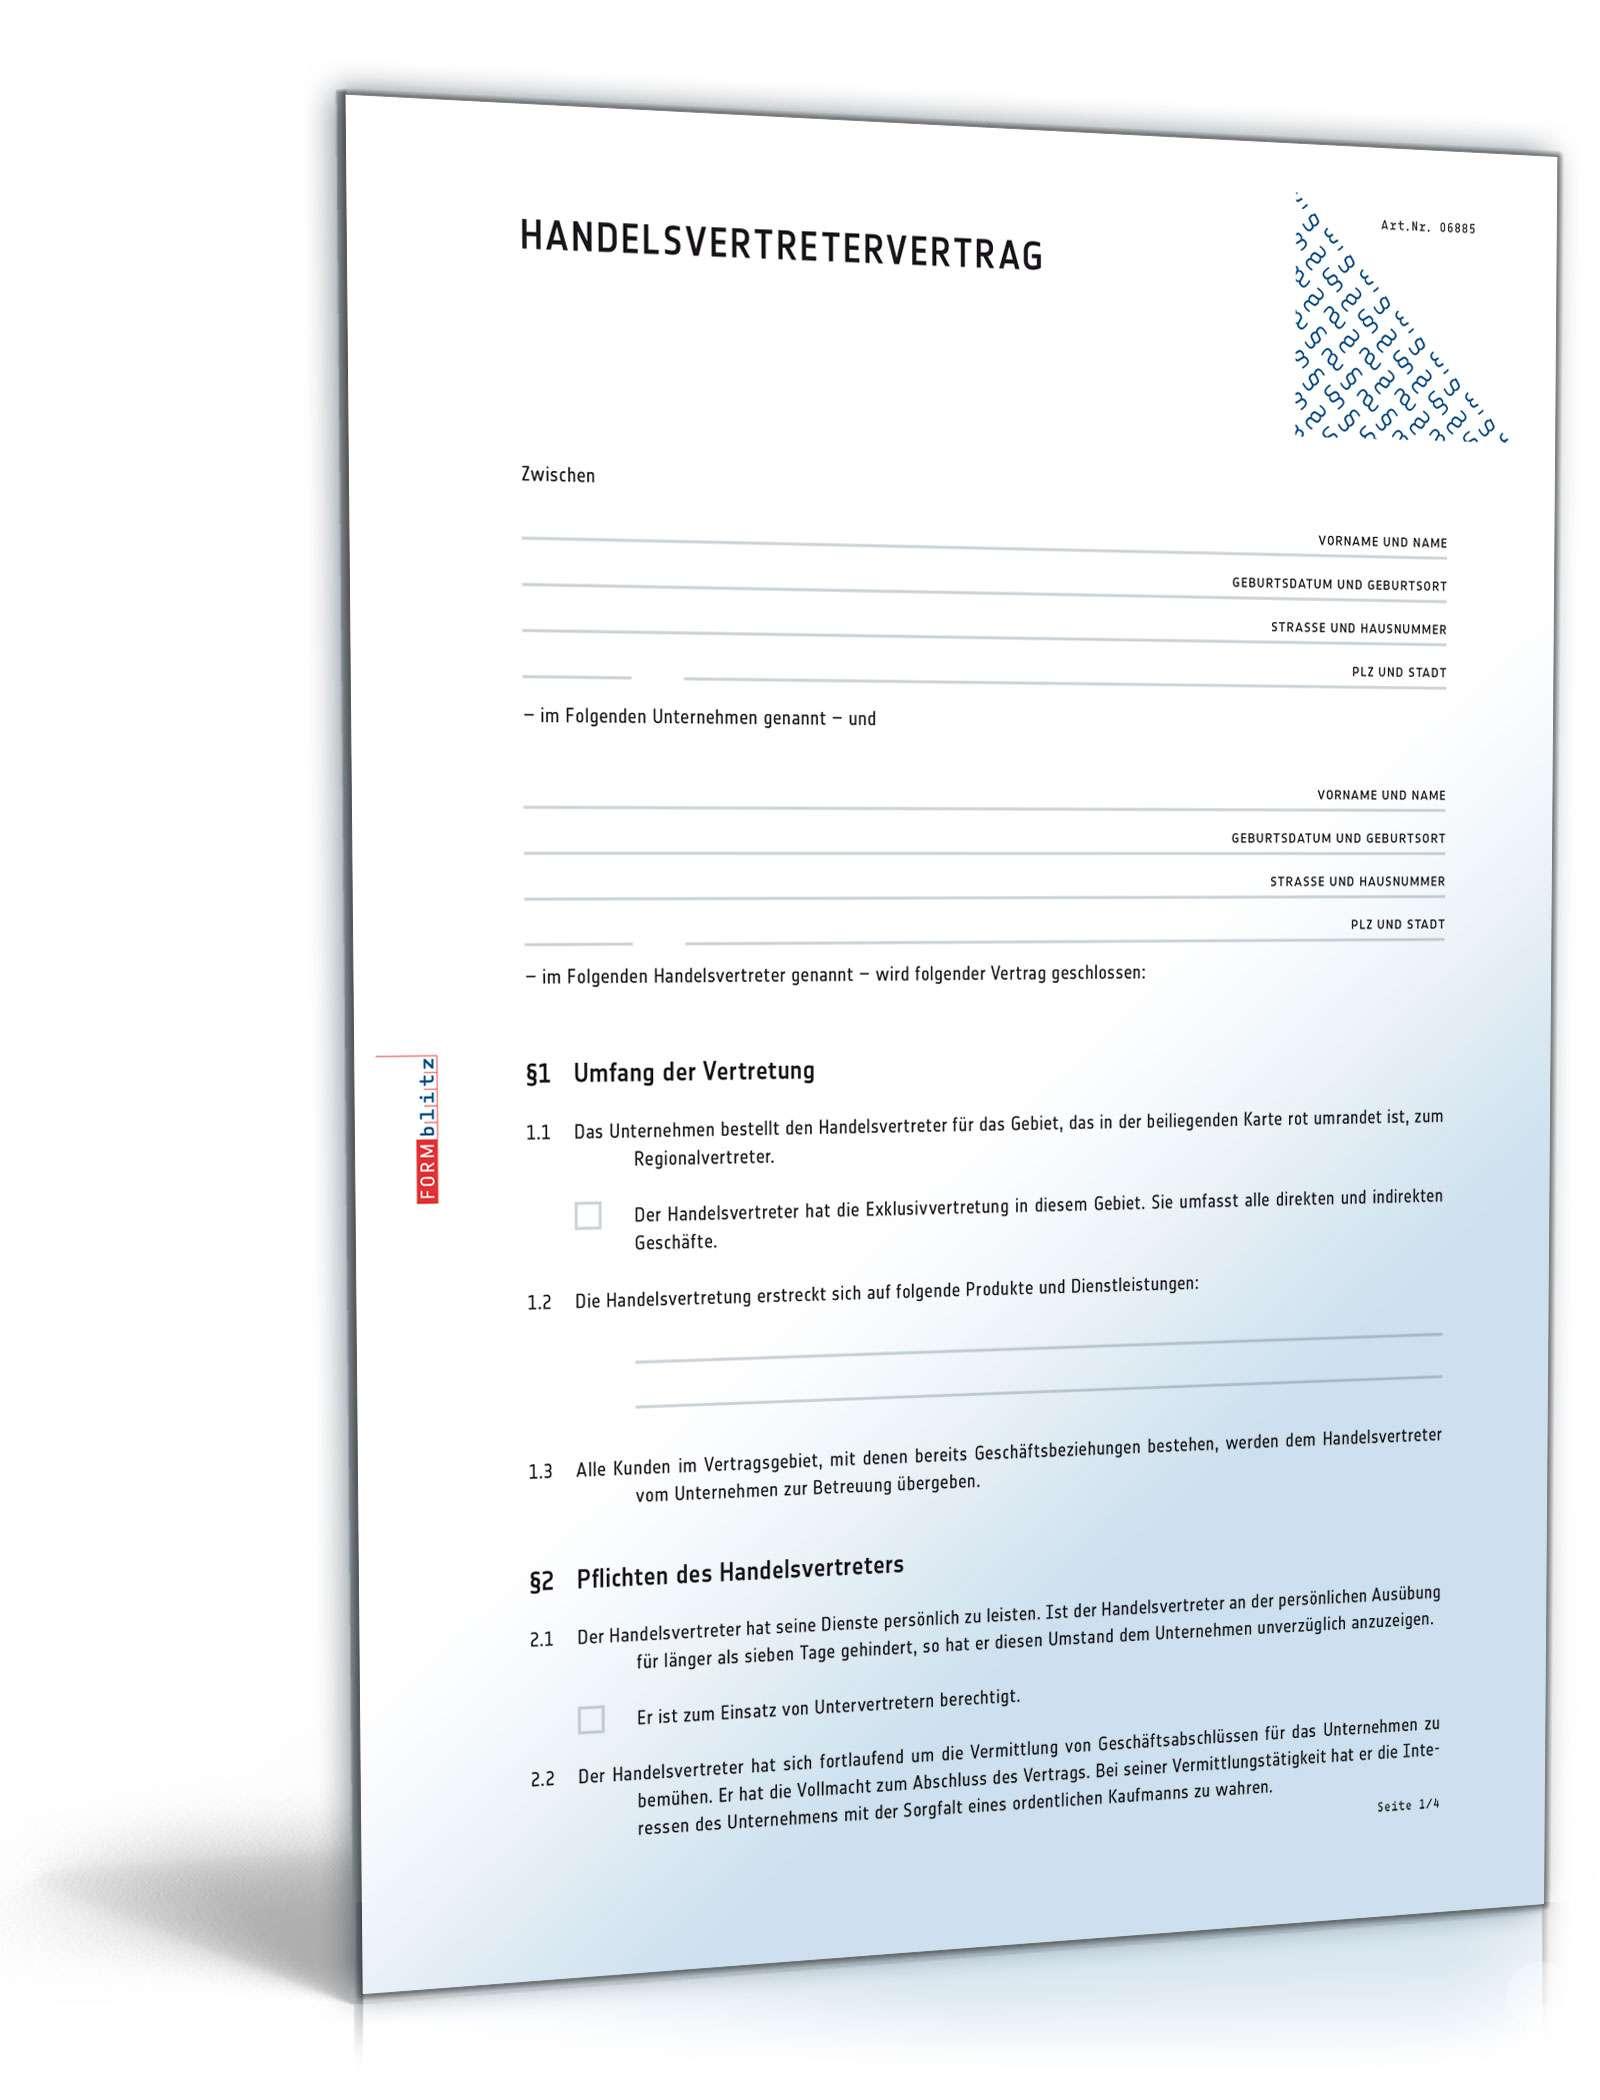 Handelsvertretervertrag Muster Zum Download